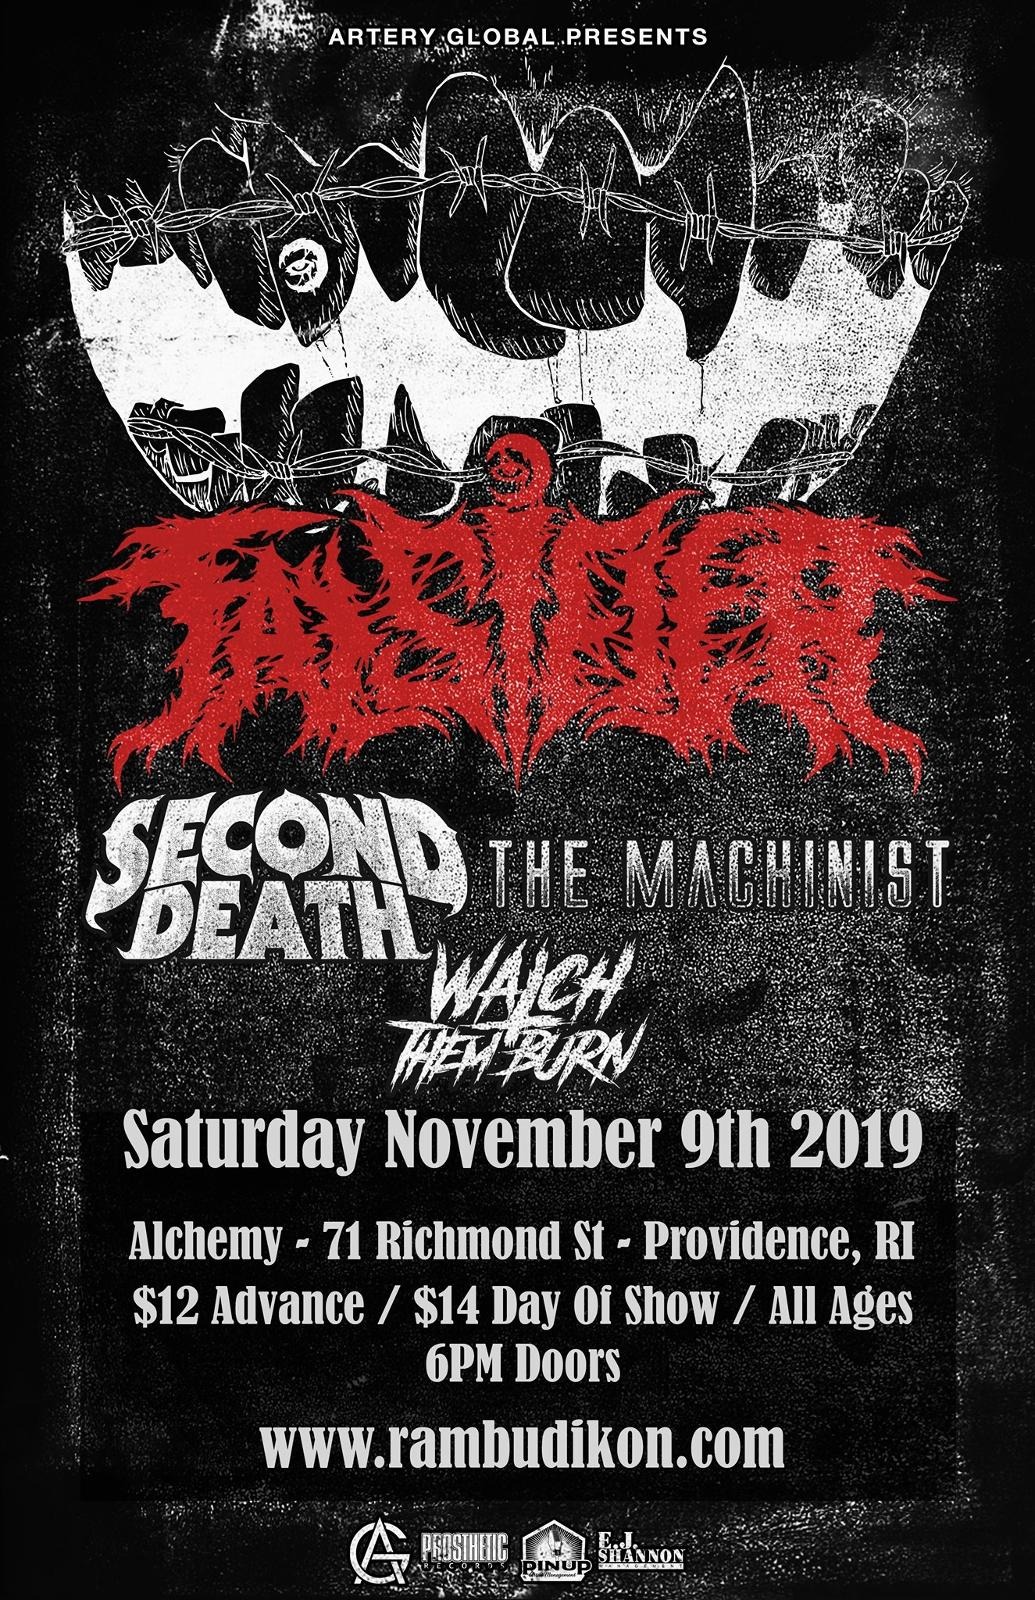 Falsifier | The Machinist  | Second Death | Watch Them Burn |